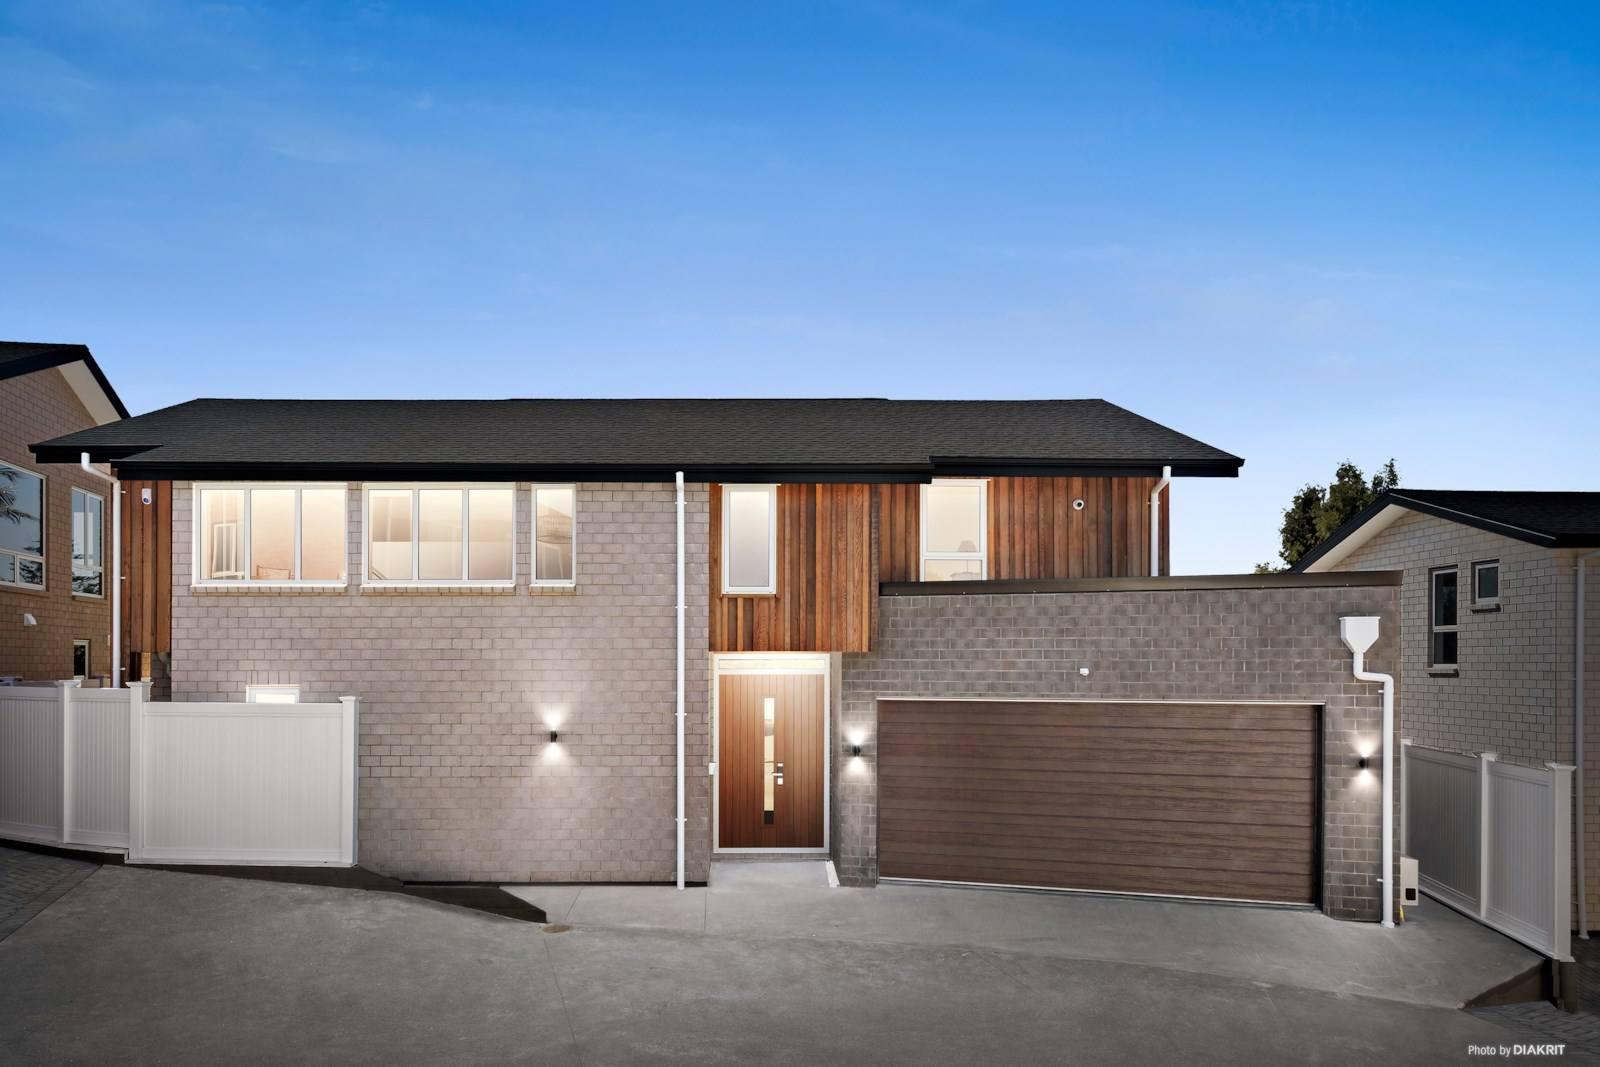 Blockhouse Bay 5房 崭新现代别墅 智能家居配套 时尚精装、宽敞布局 学区与地段兼备 品味理想居住生活 Brand New! Amazing One of a Kind Family Home